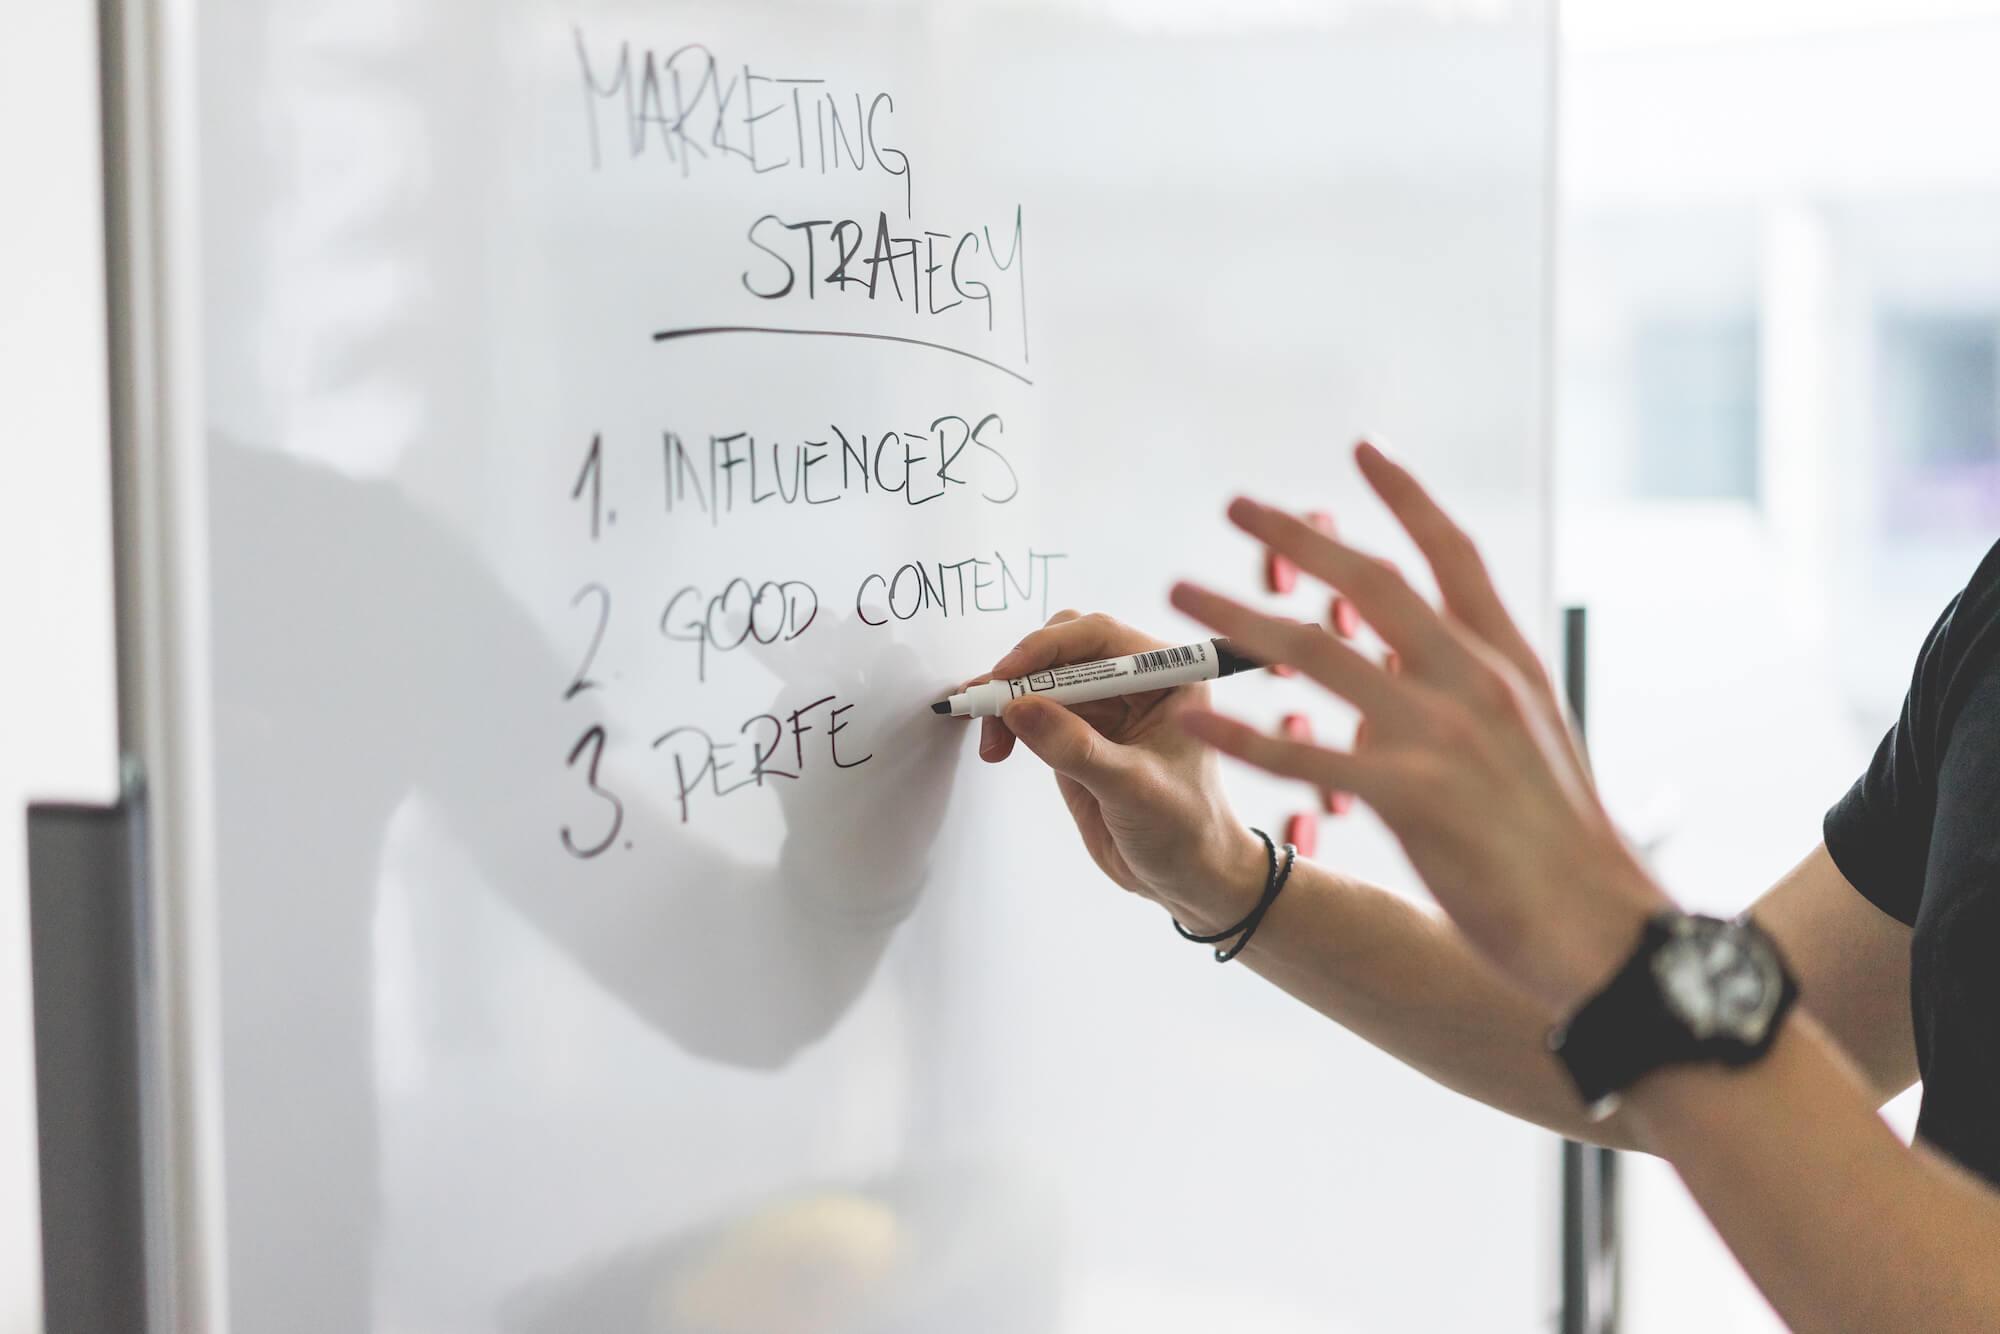 Pilihan Strategi Marketing untuk Freelancer 1